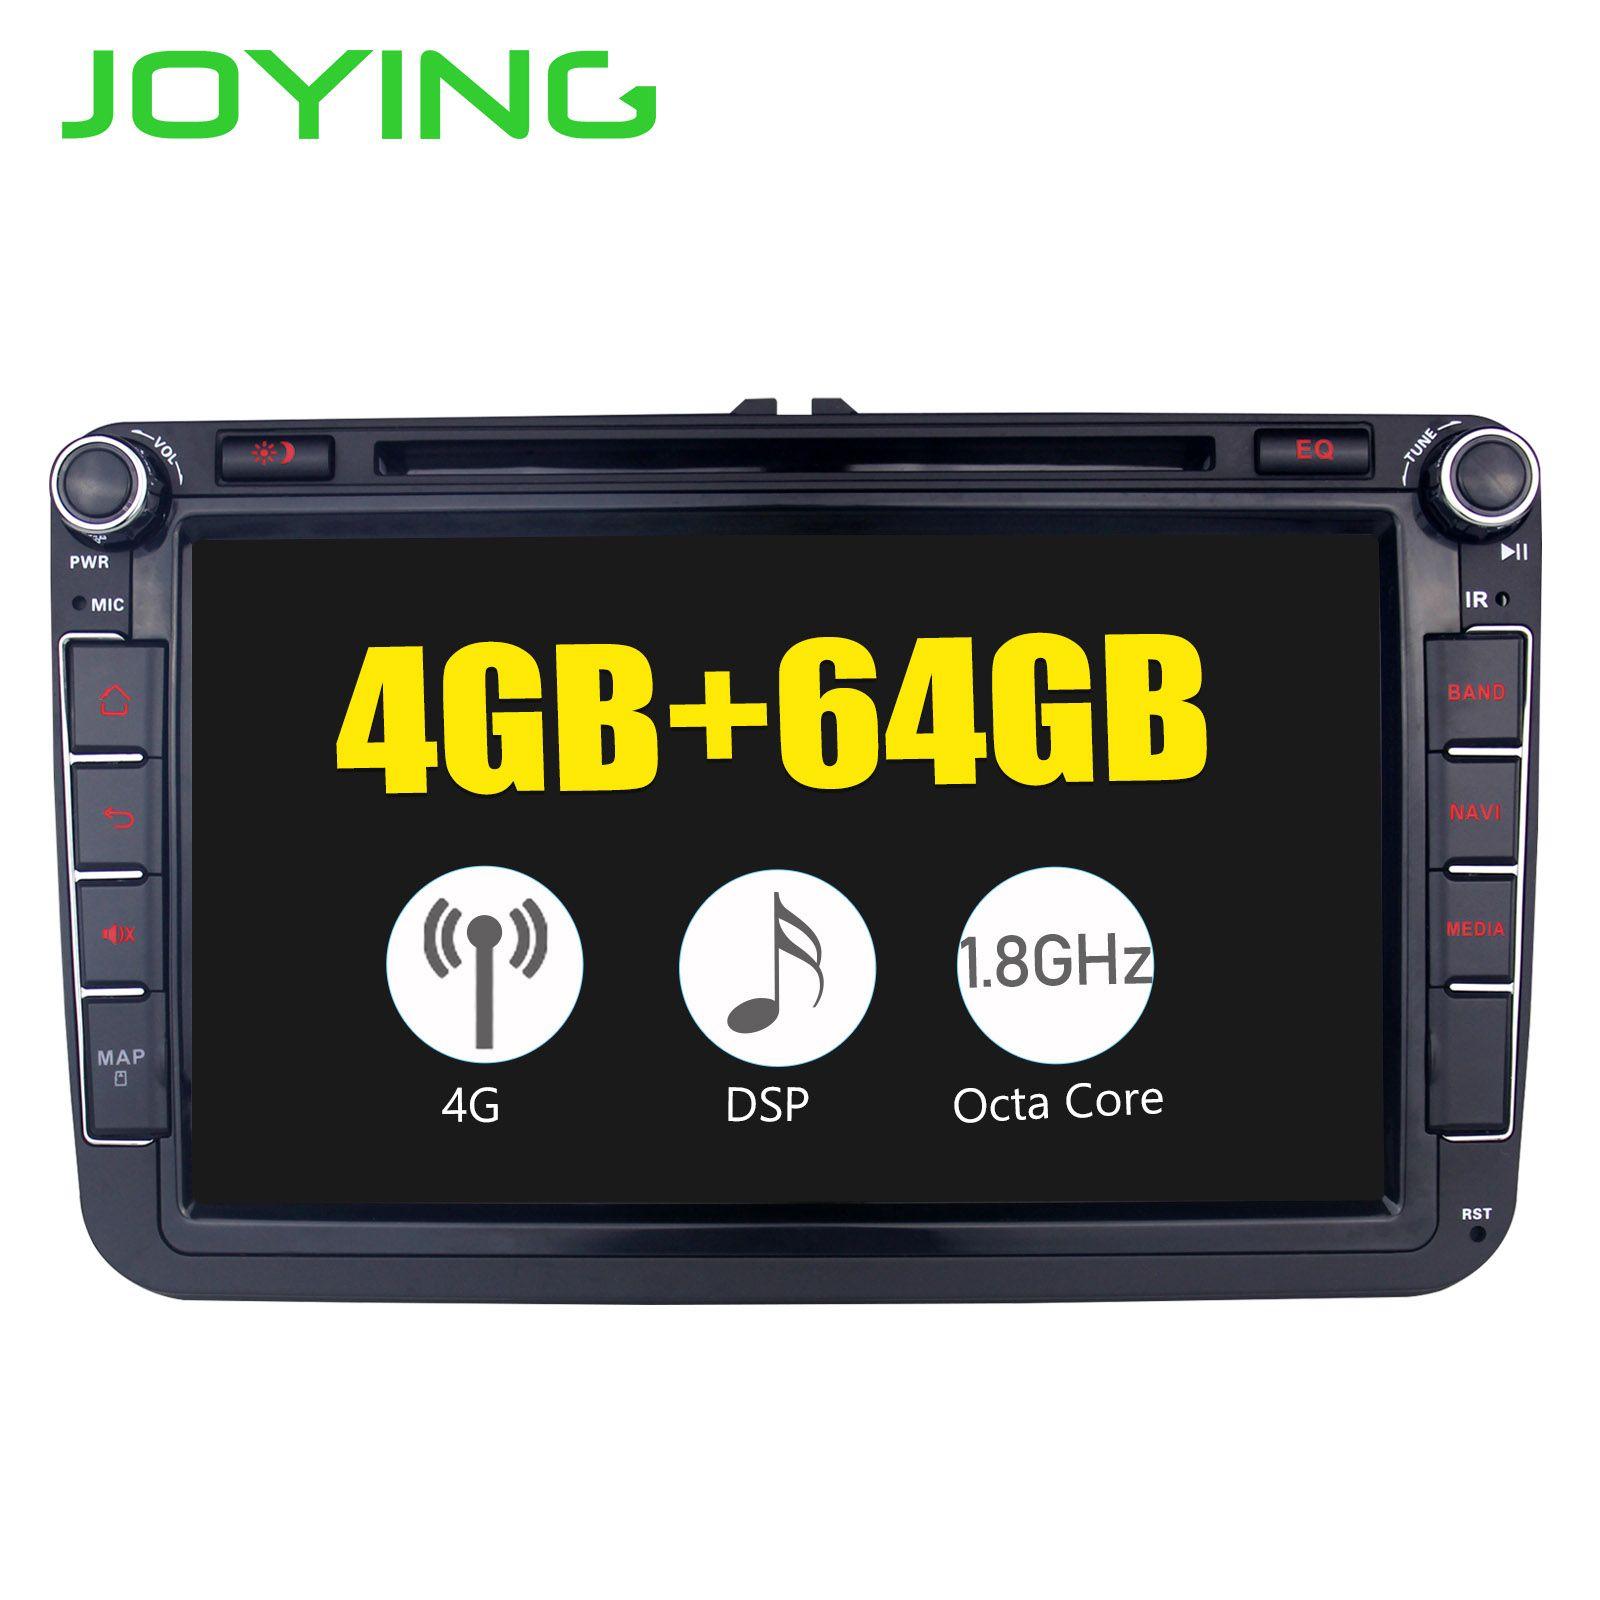 JOYING 4 GB Android 8.1 auto radio GPS player 8 core kopf einheit mit SPDIF für VW POLO/JETTA/ SKODA/Octivia/SuperB Band recorder